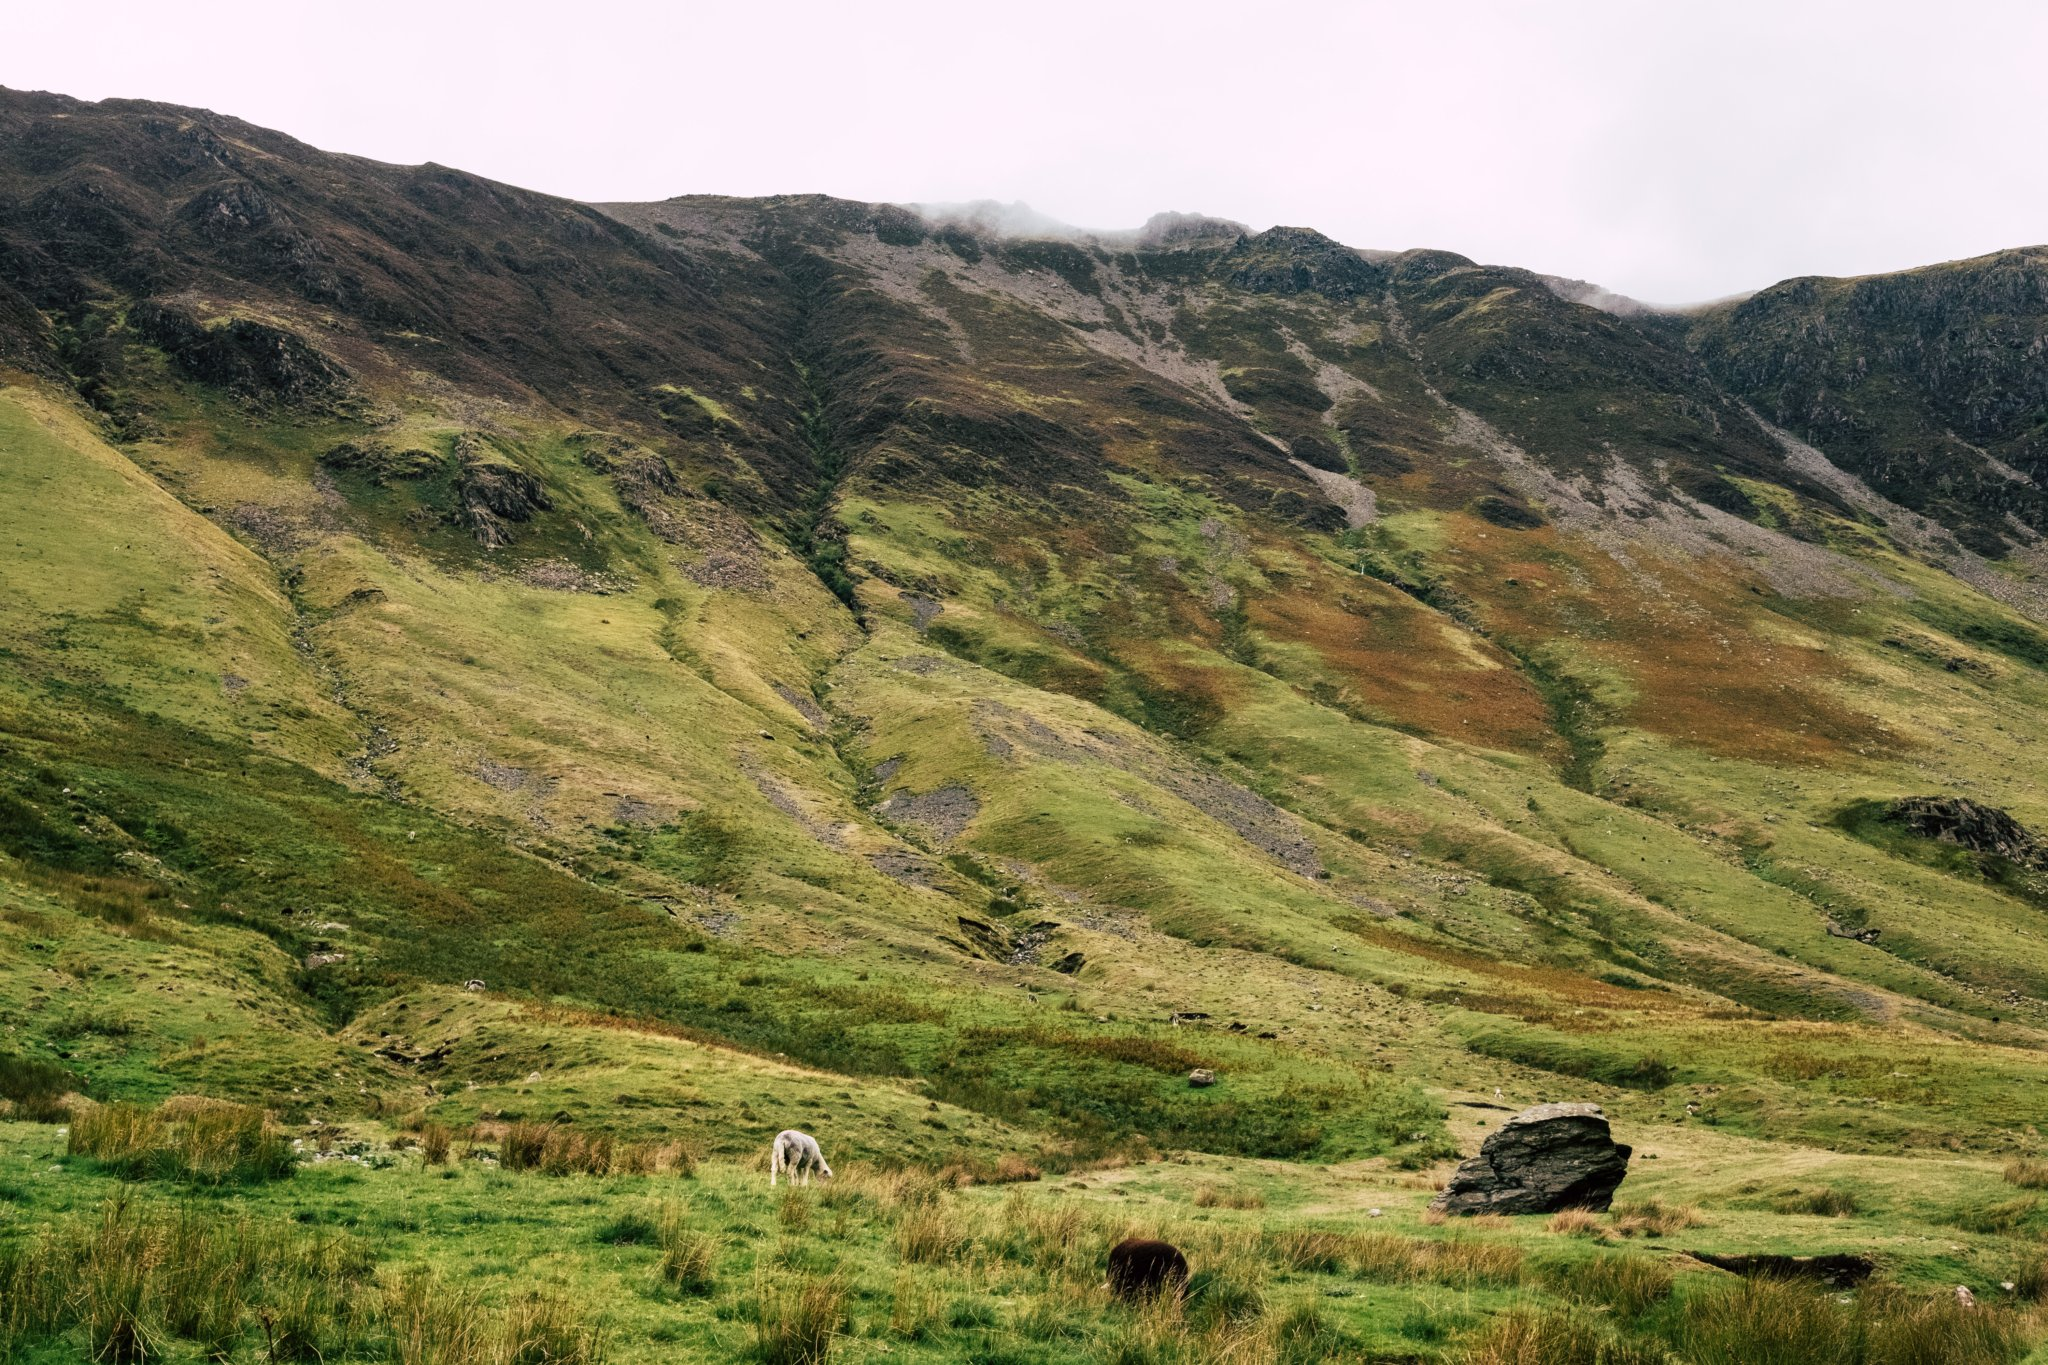 Local wildlife charity moorland